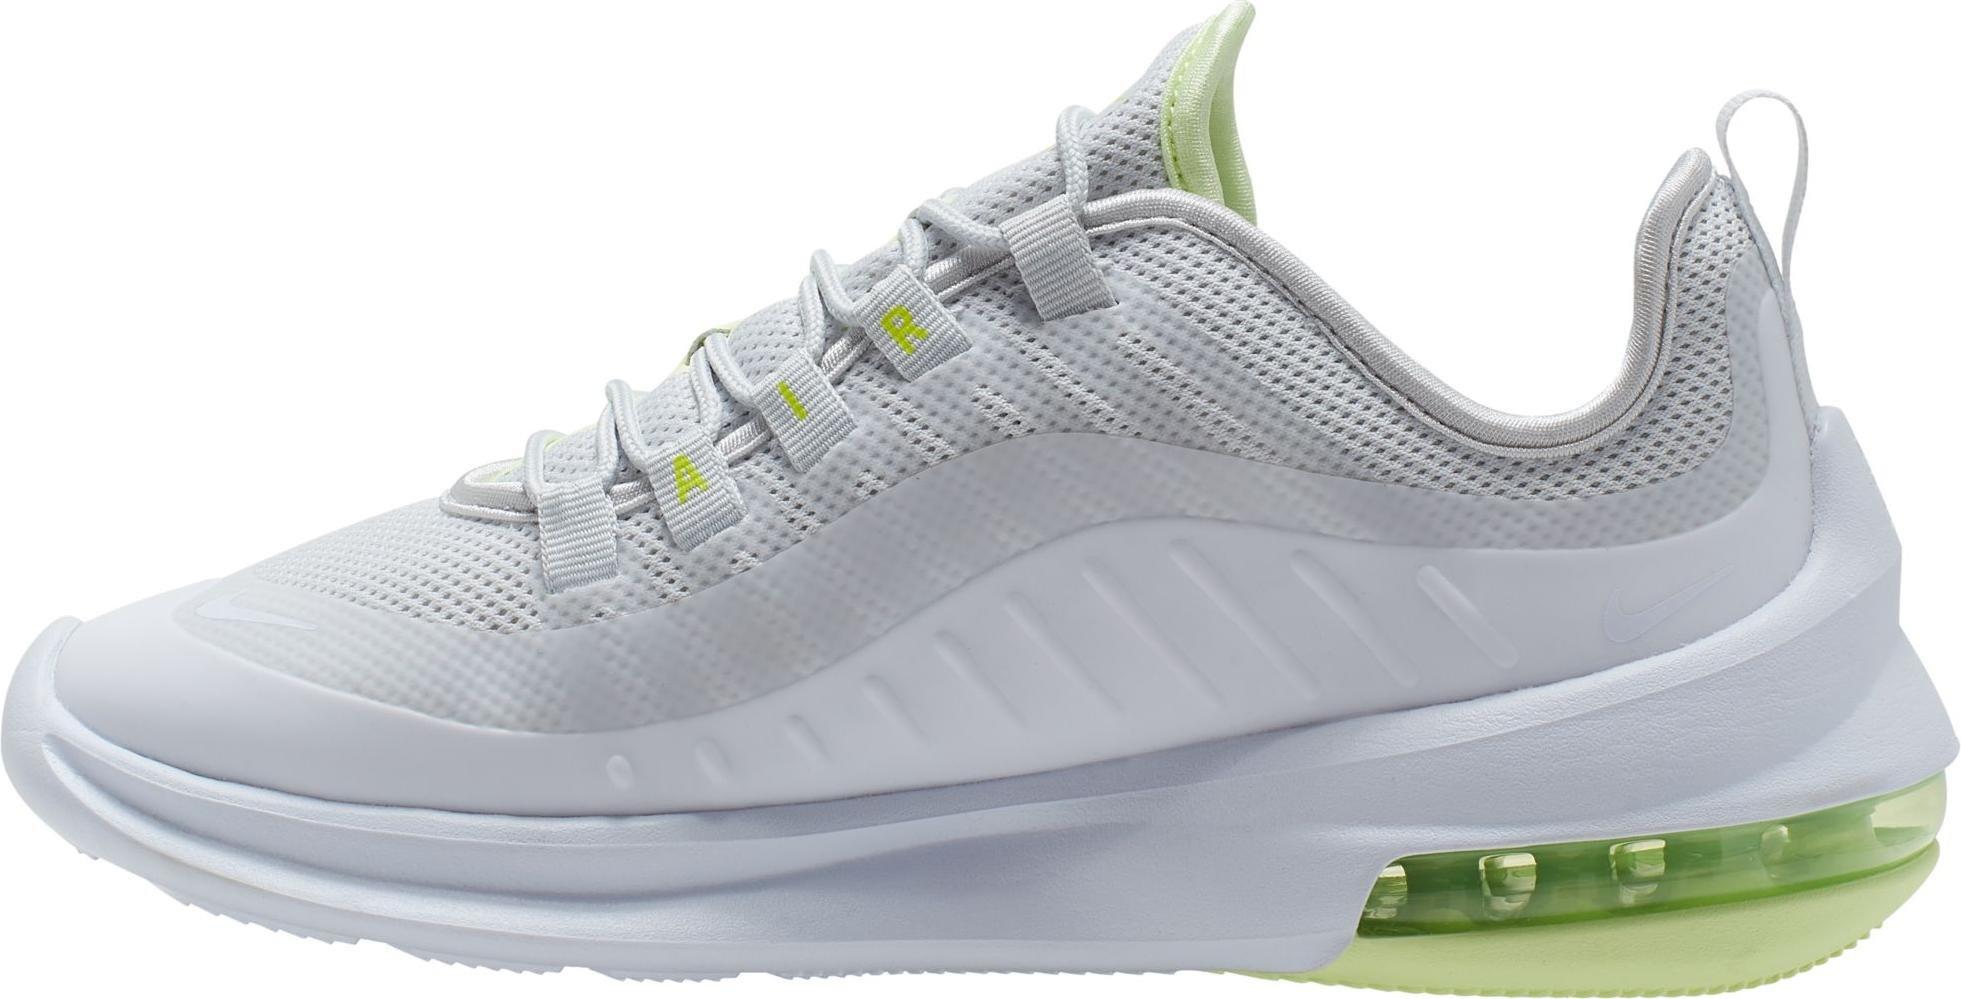 nike women's air max axis shoes